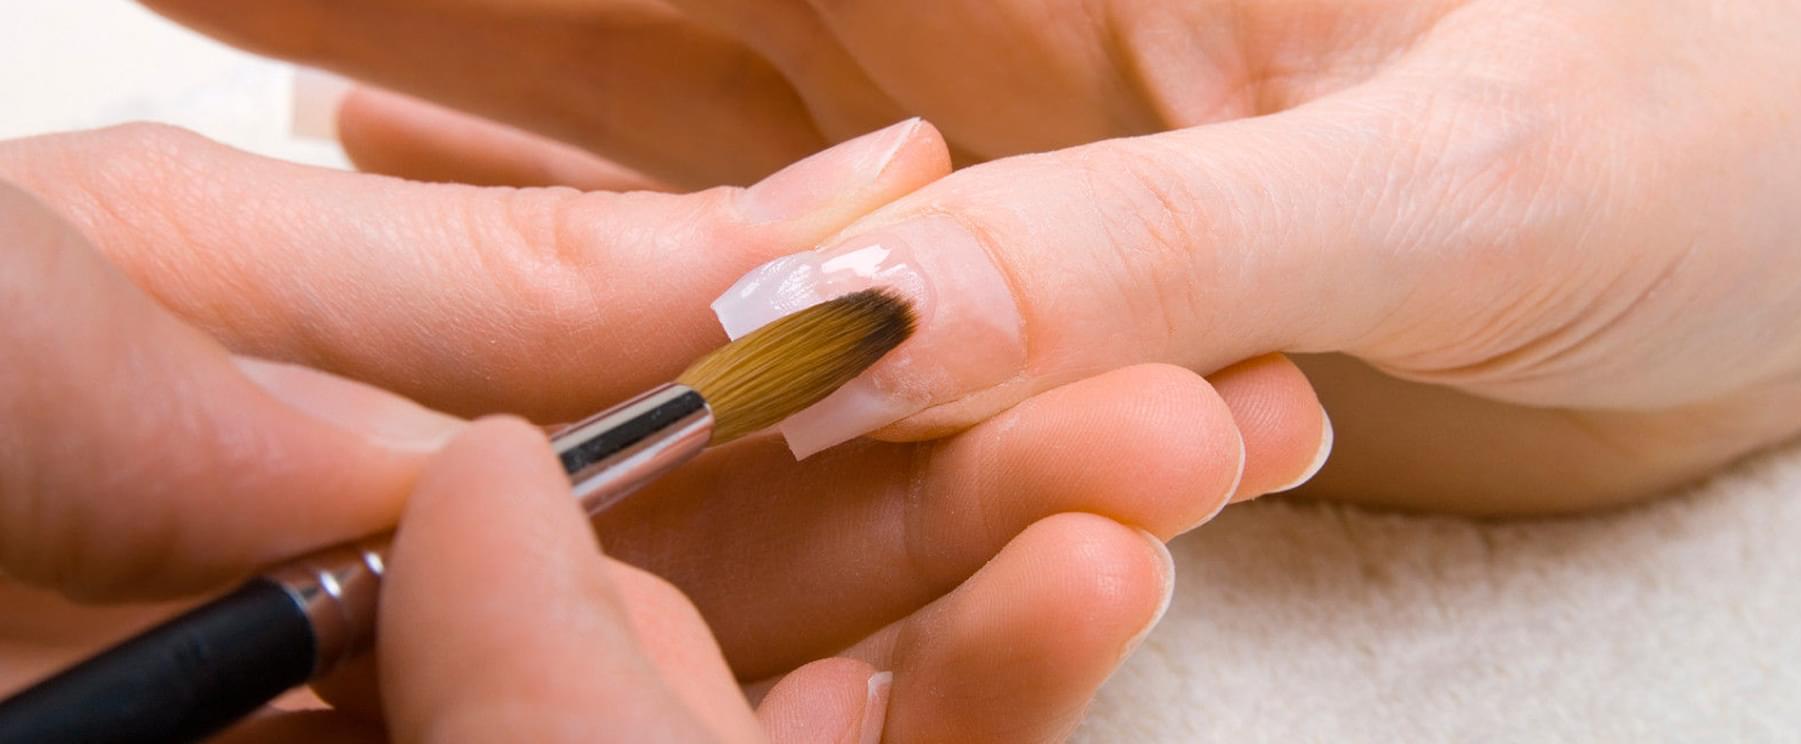 Ремонт ногтей в салоне маникюра Missliise в Москве